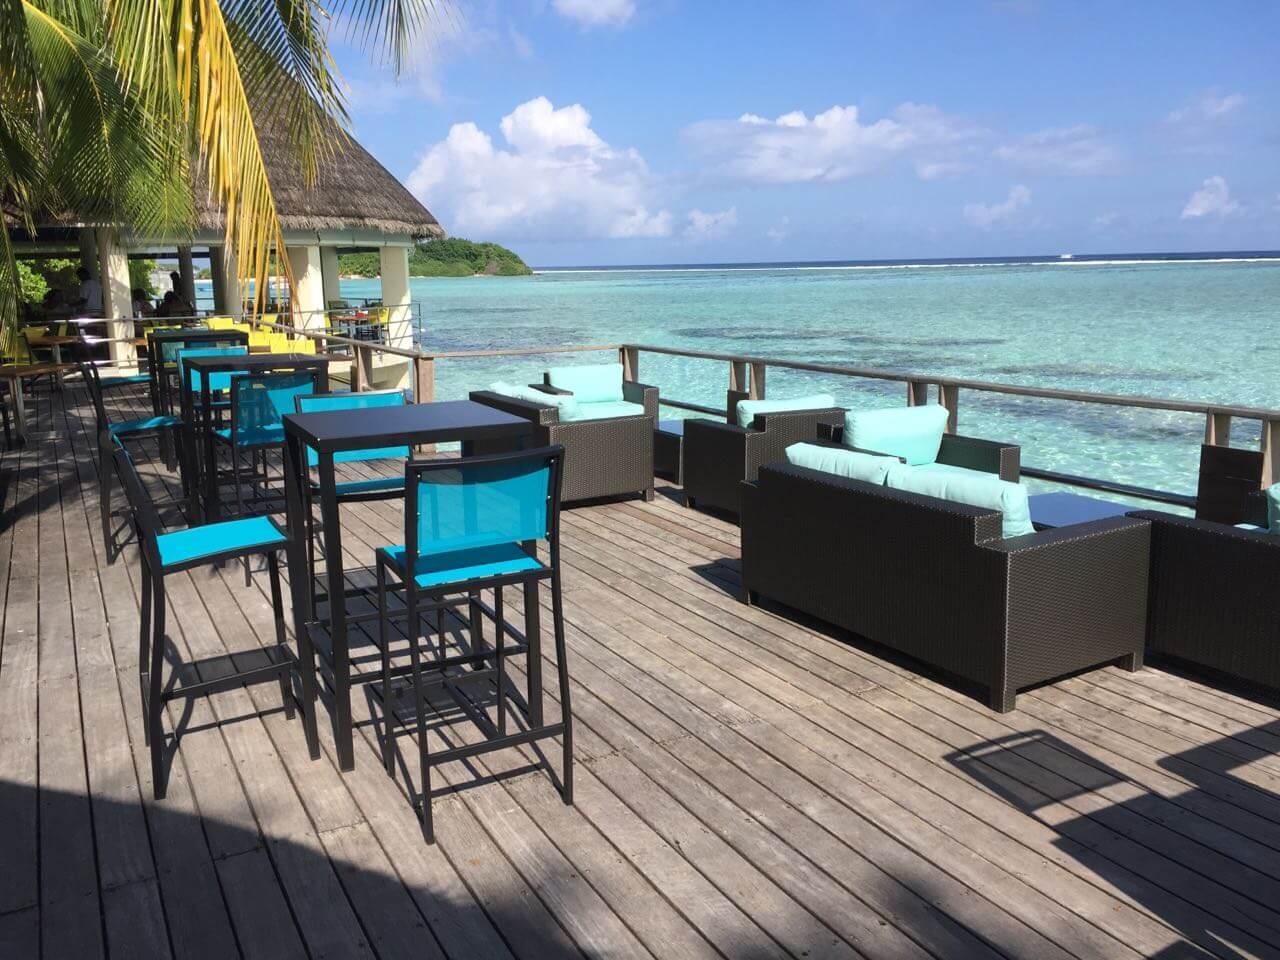 ClubMed-Maldives